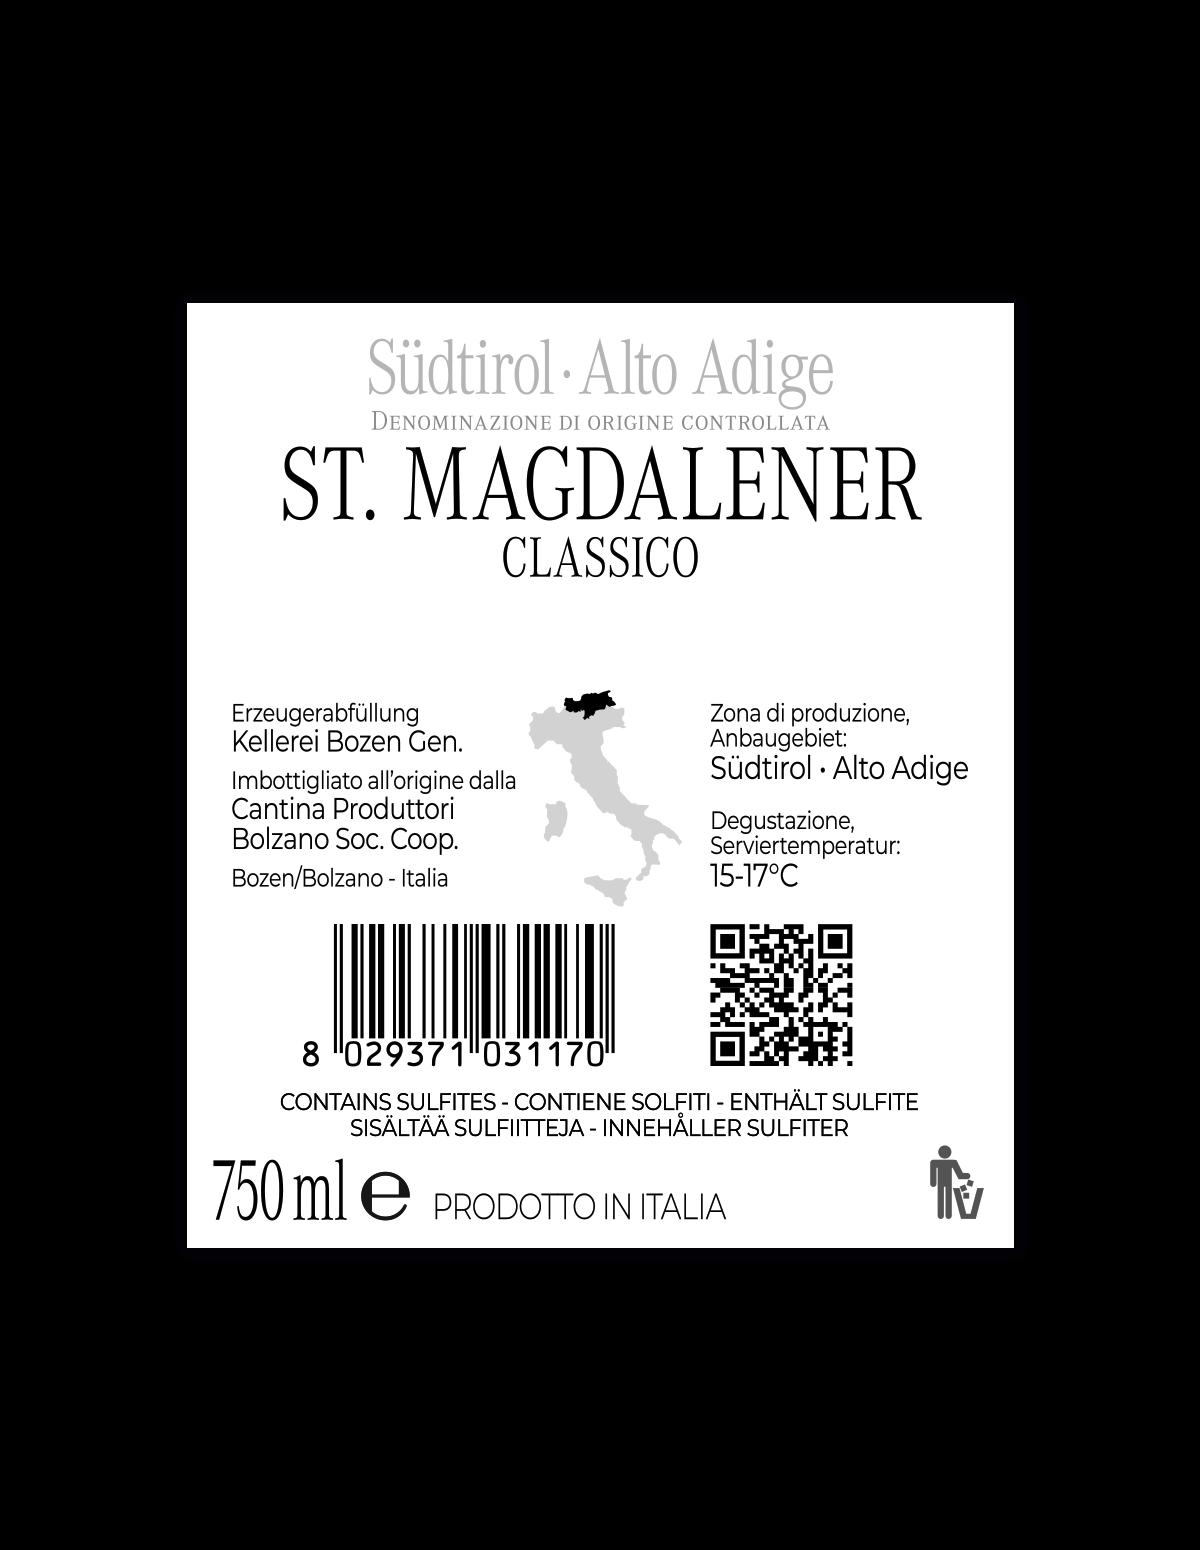 ST. MAGDALENER CLASSICO Südtirol • Alto Adige DOC 2019